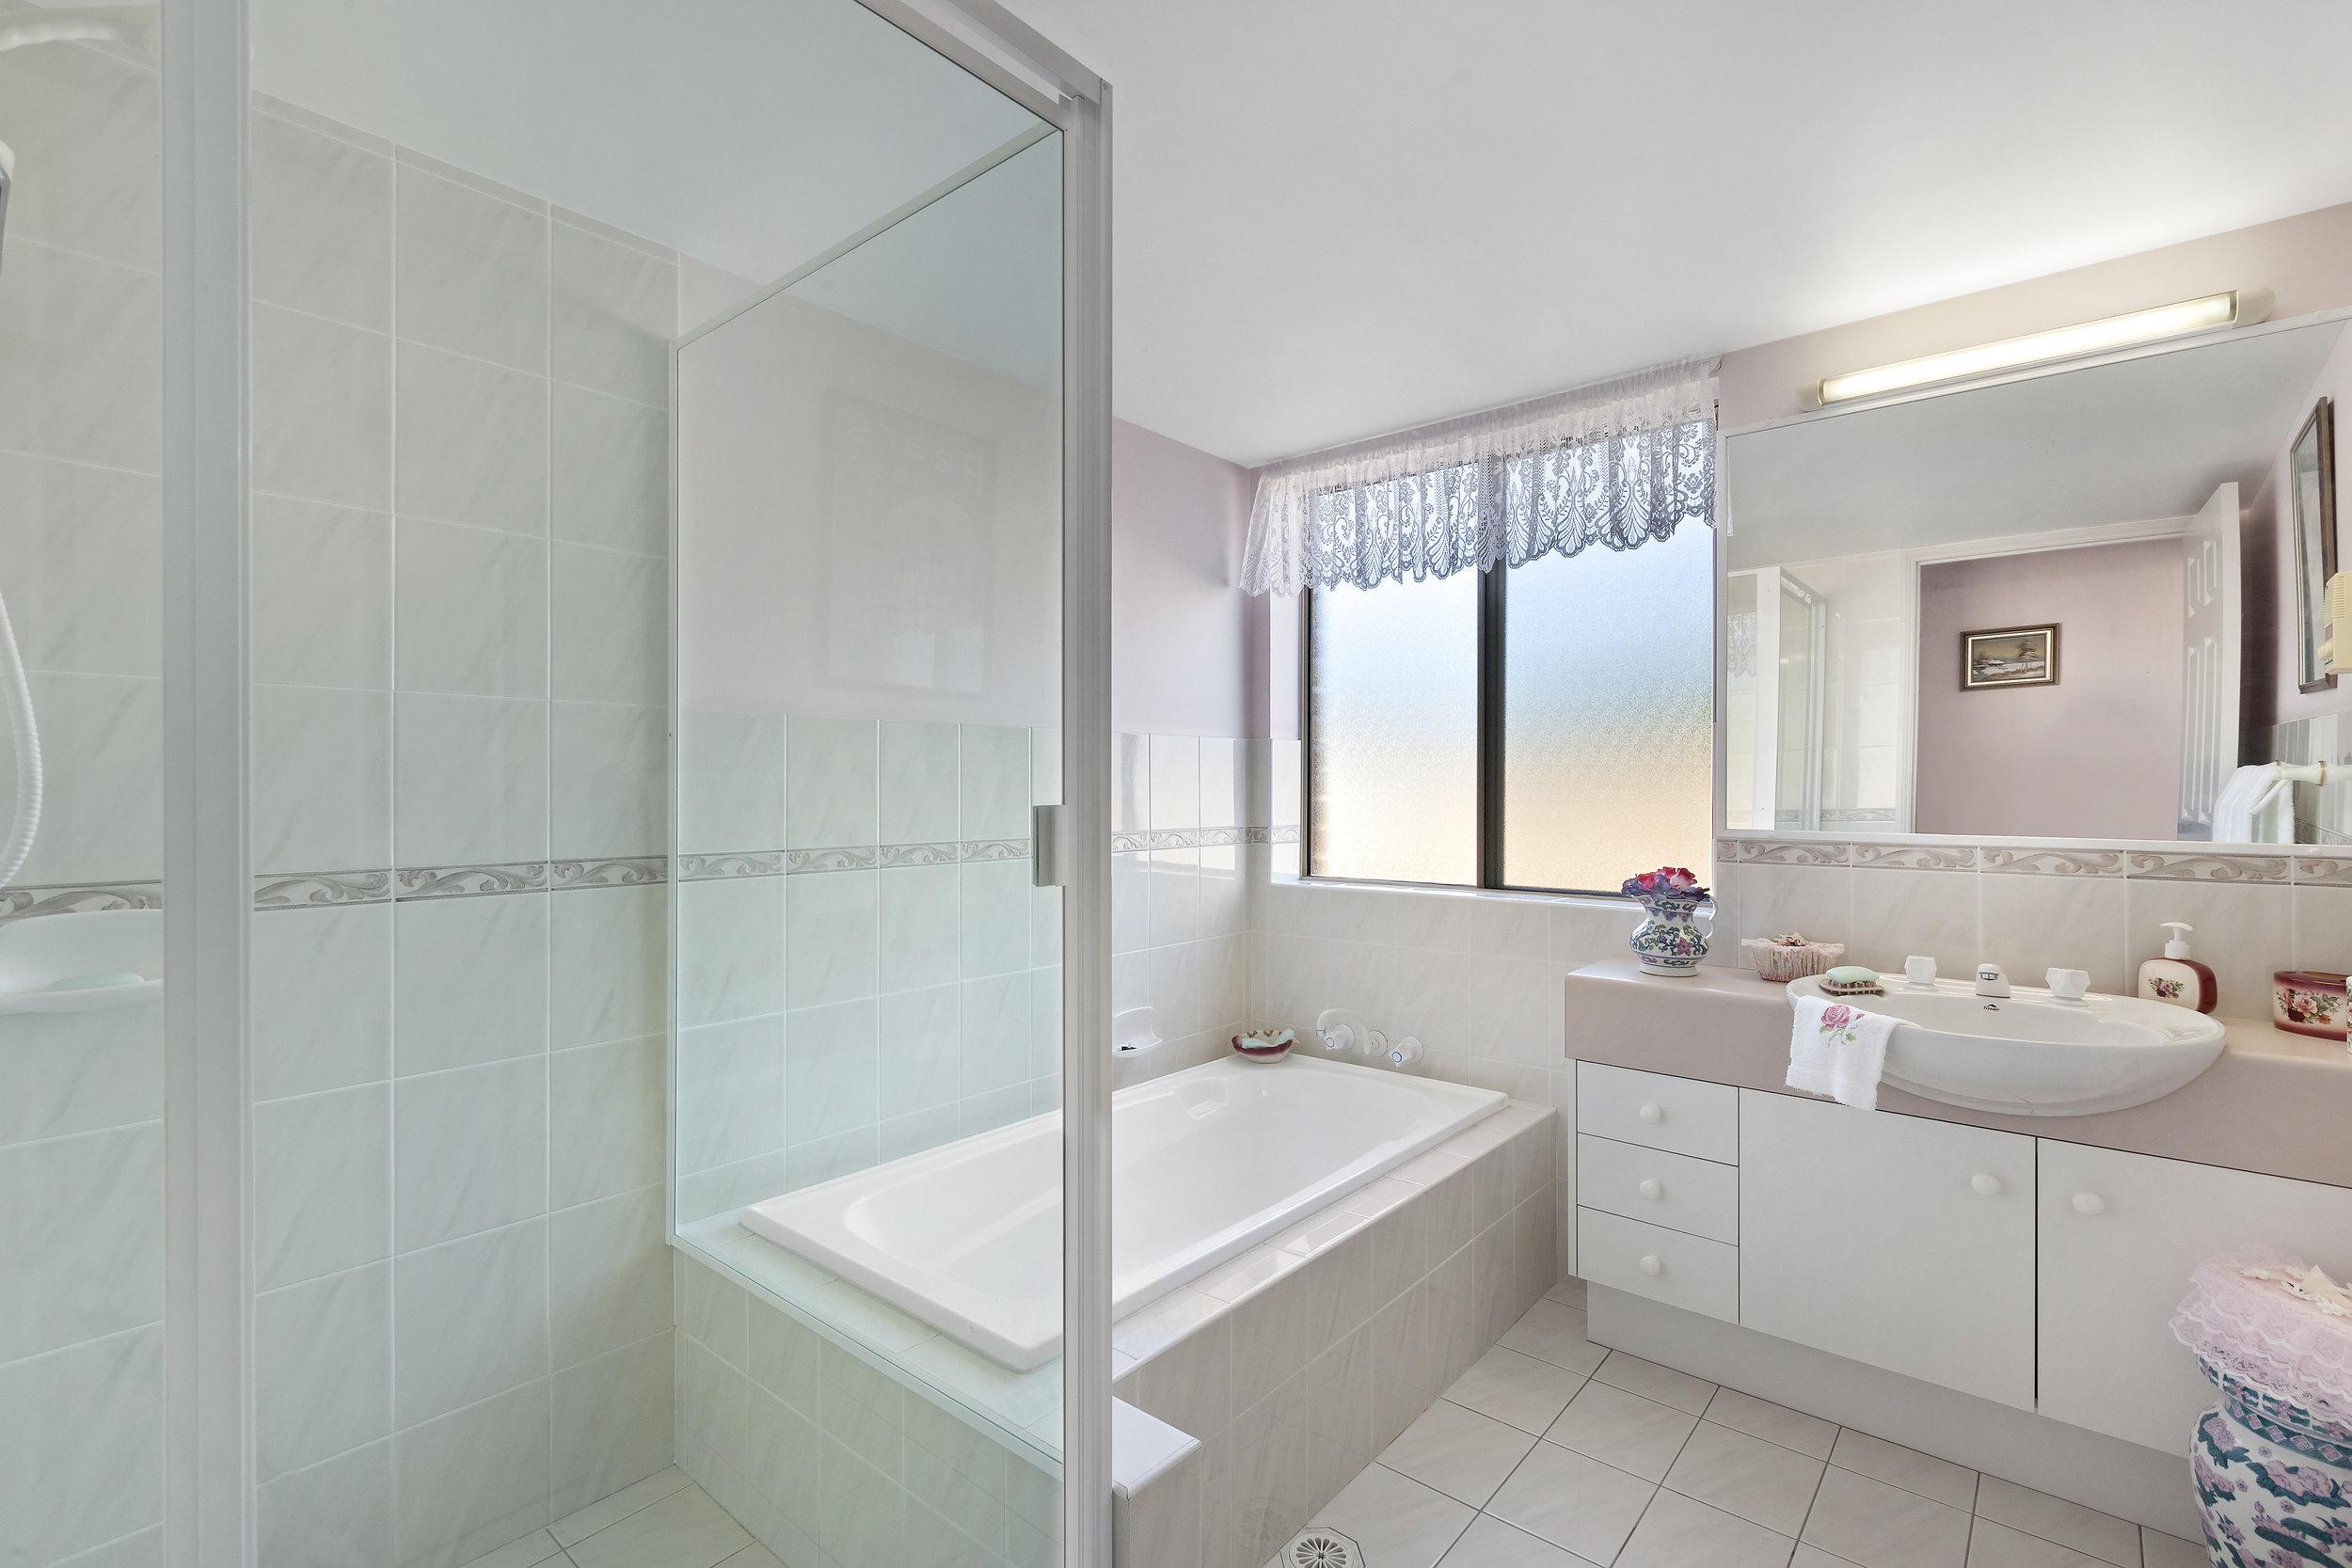 7-Bathroom.jpg